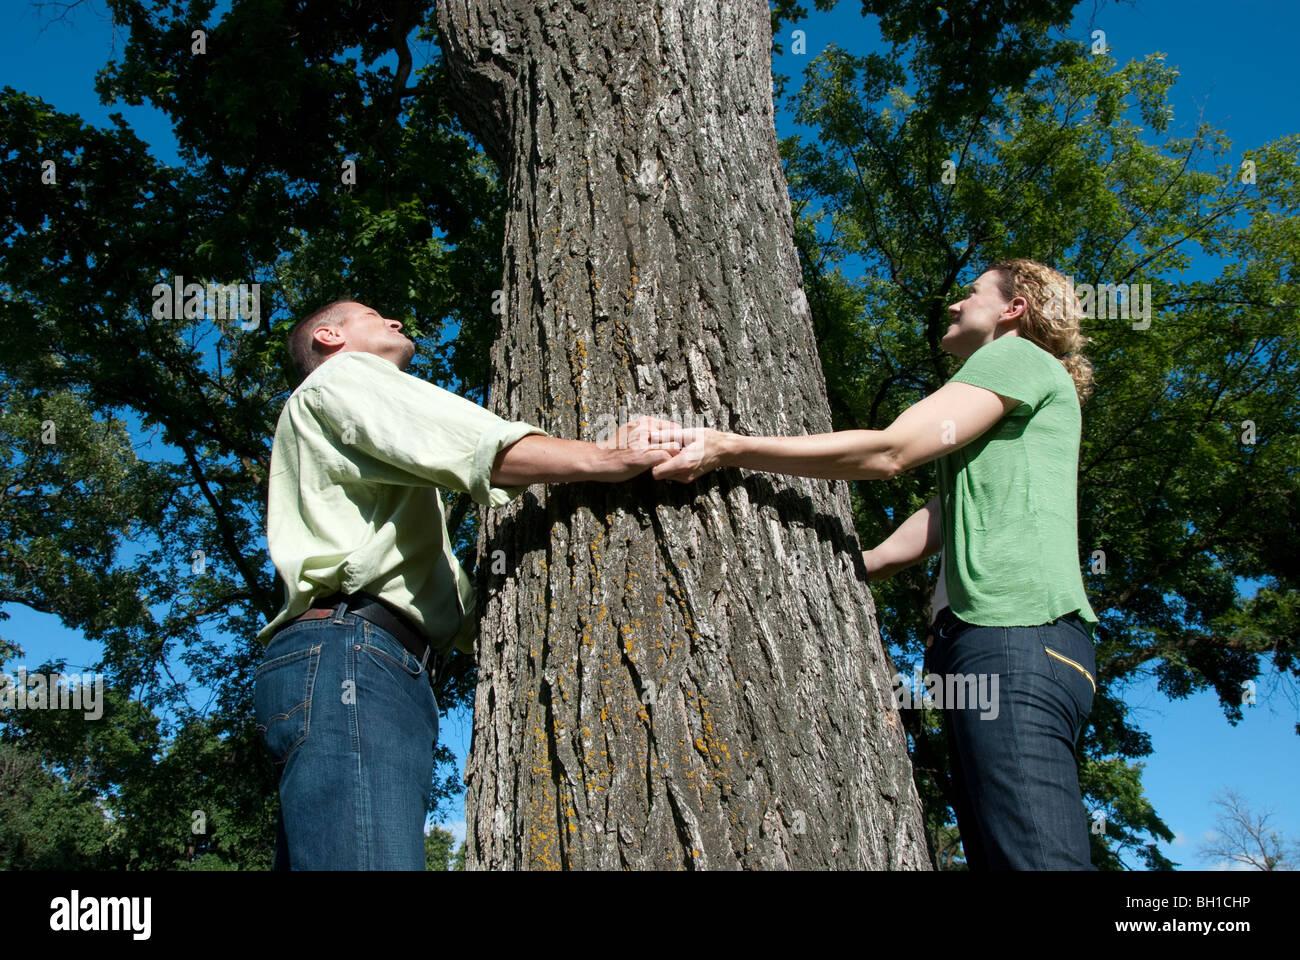 Couple hold hands around large tree, Assiniboine Park, Winnipeg, Manitoba, Canada Stock Photo